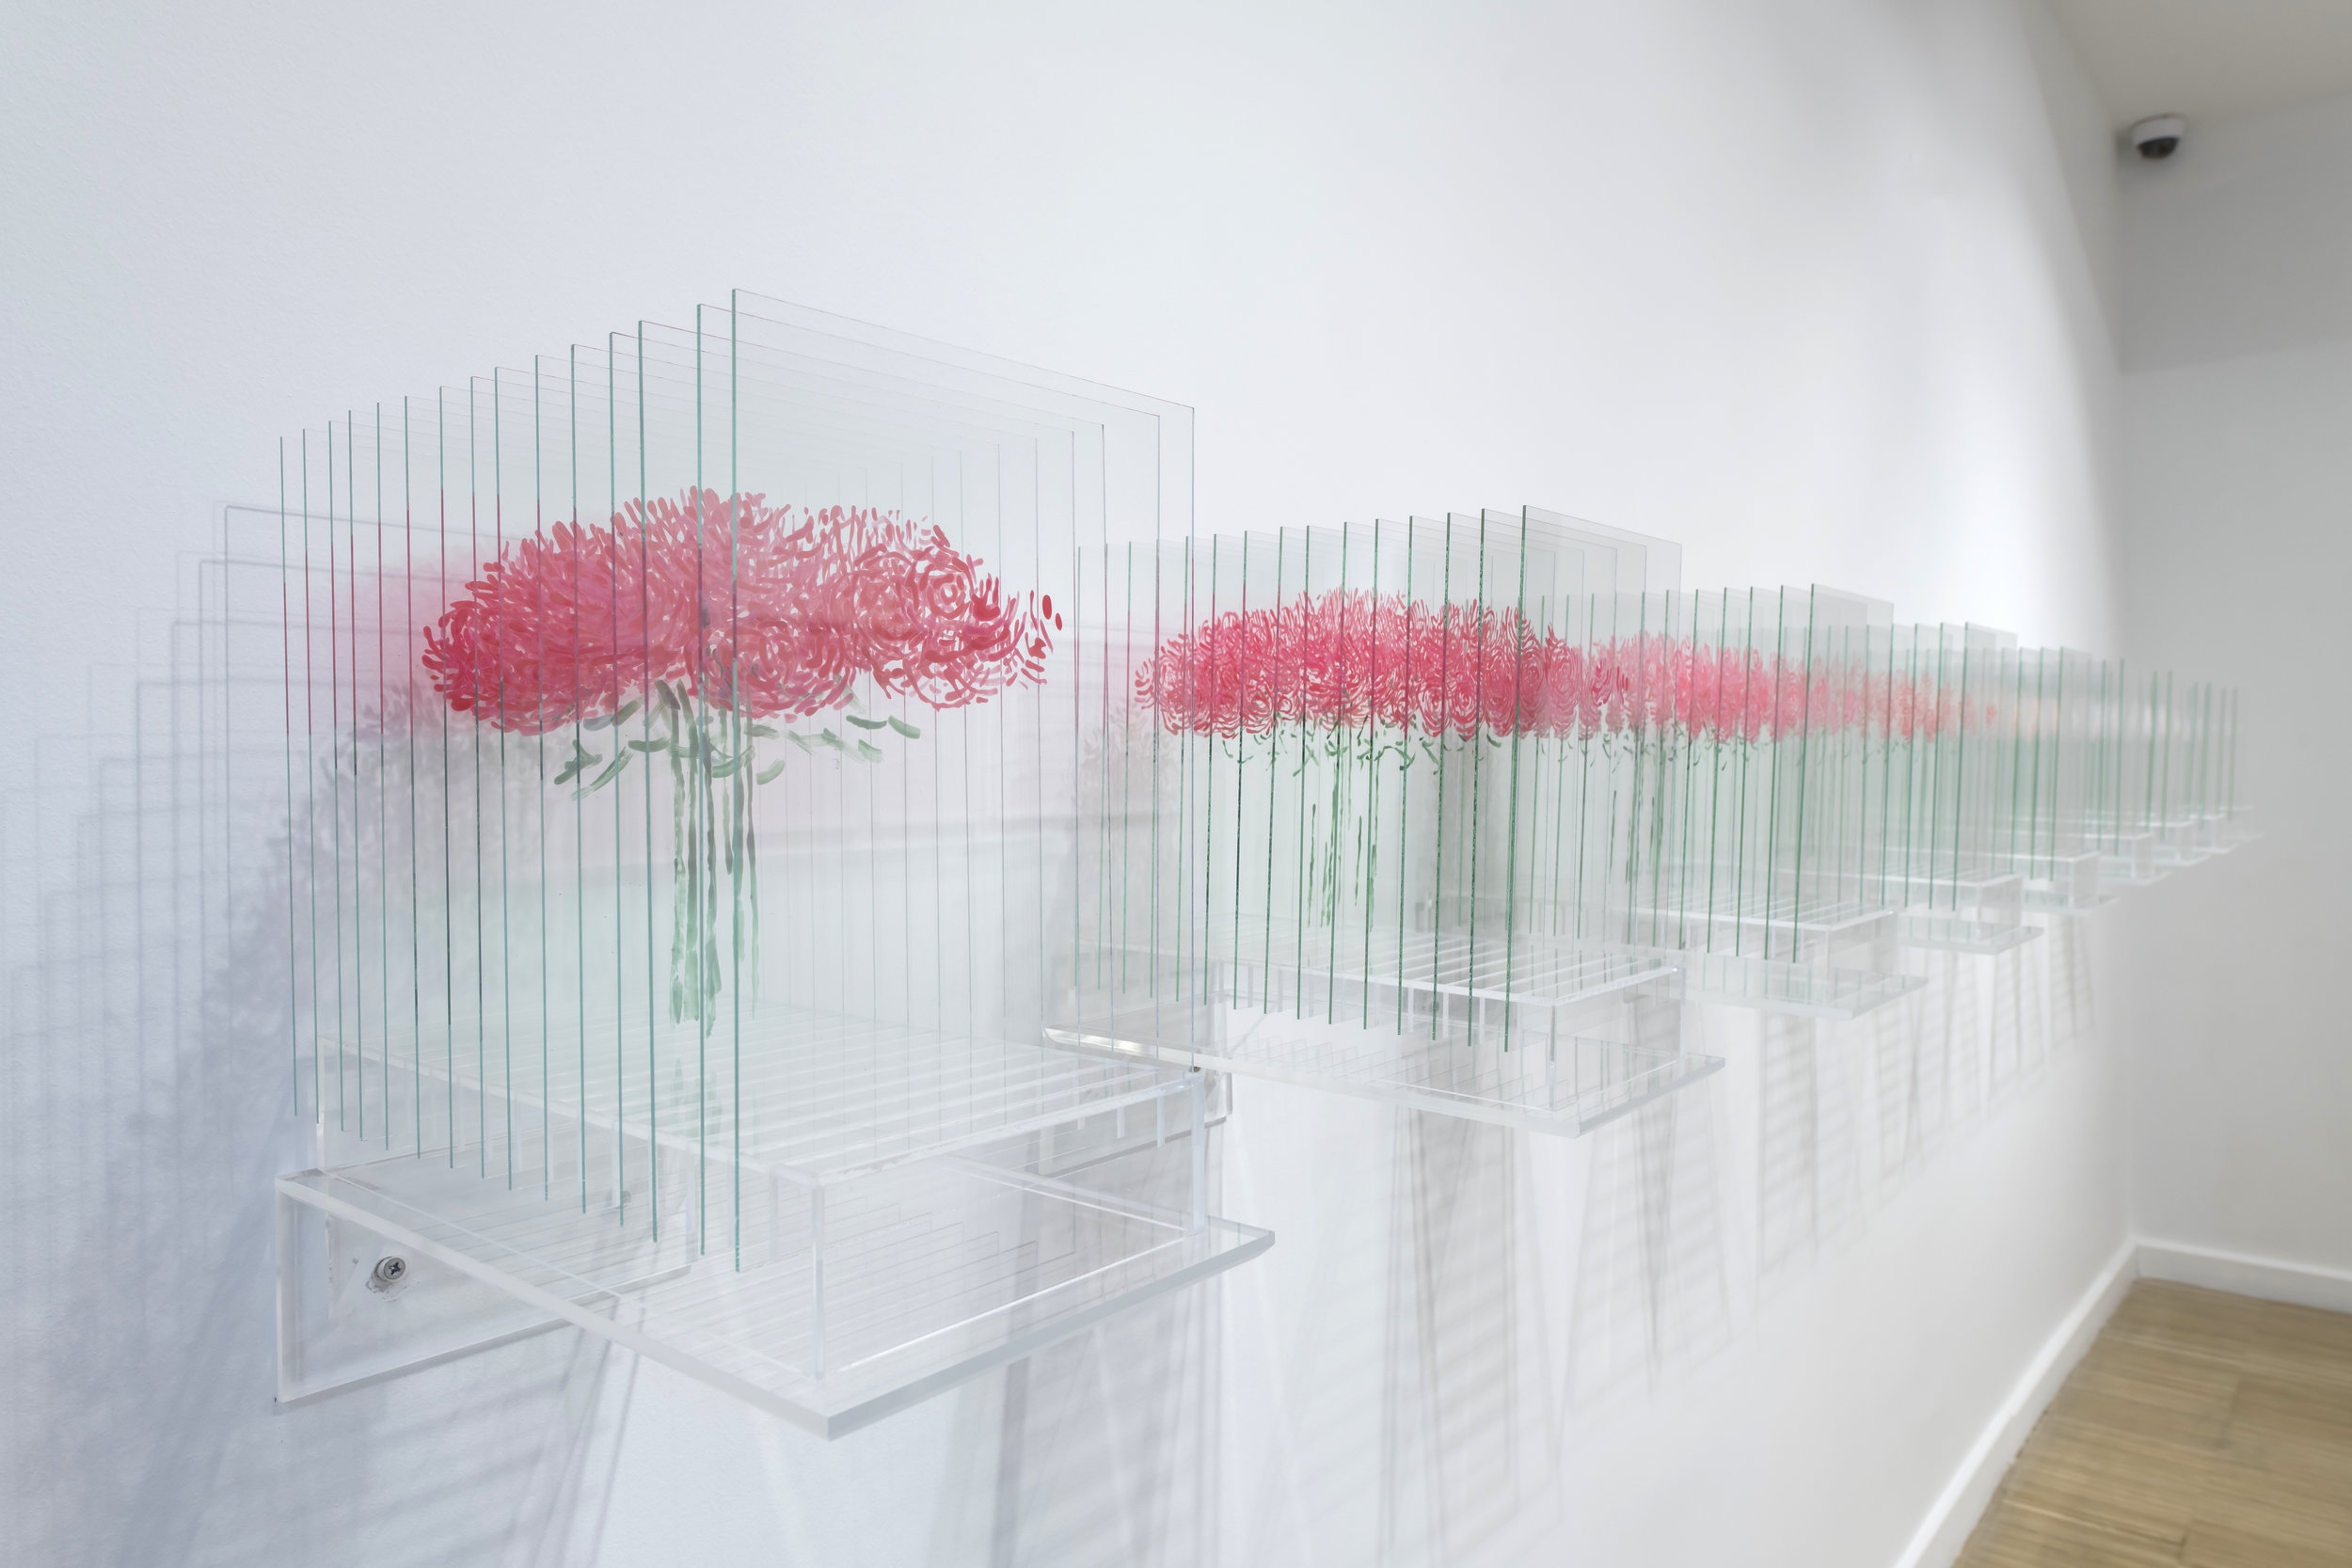 Anna Laudel Gallery,Ardan Özmenoglu, Pantone Pink Rose 1-9, 2018, Nail polish on 15 glass panels on plexi base, 13x8x15.5in each,2.jpg